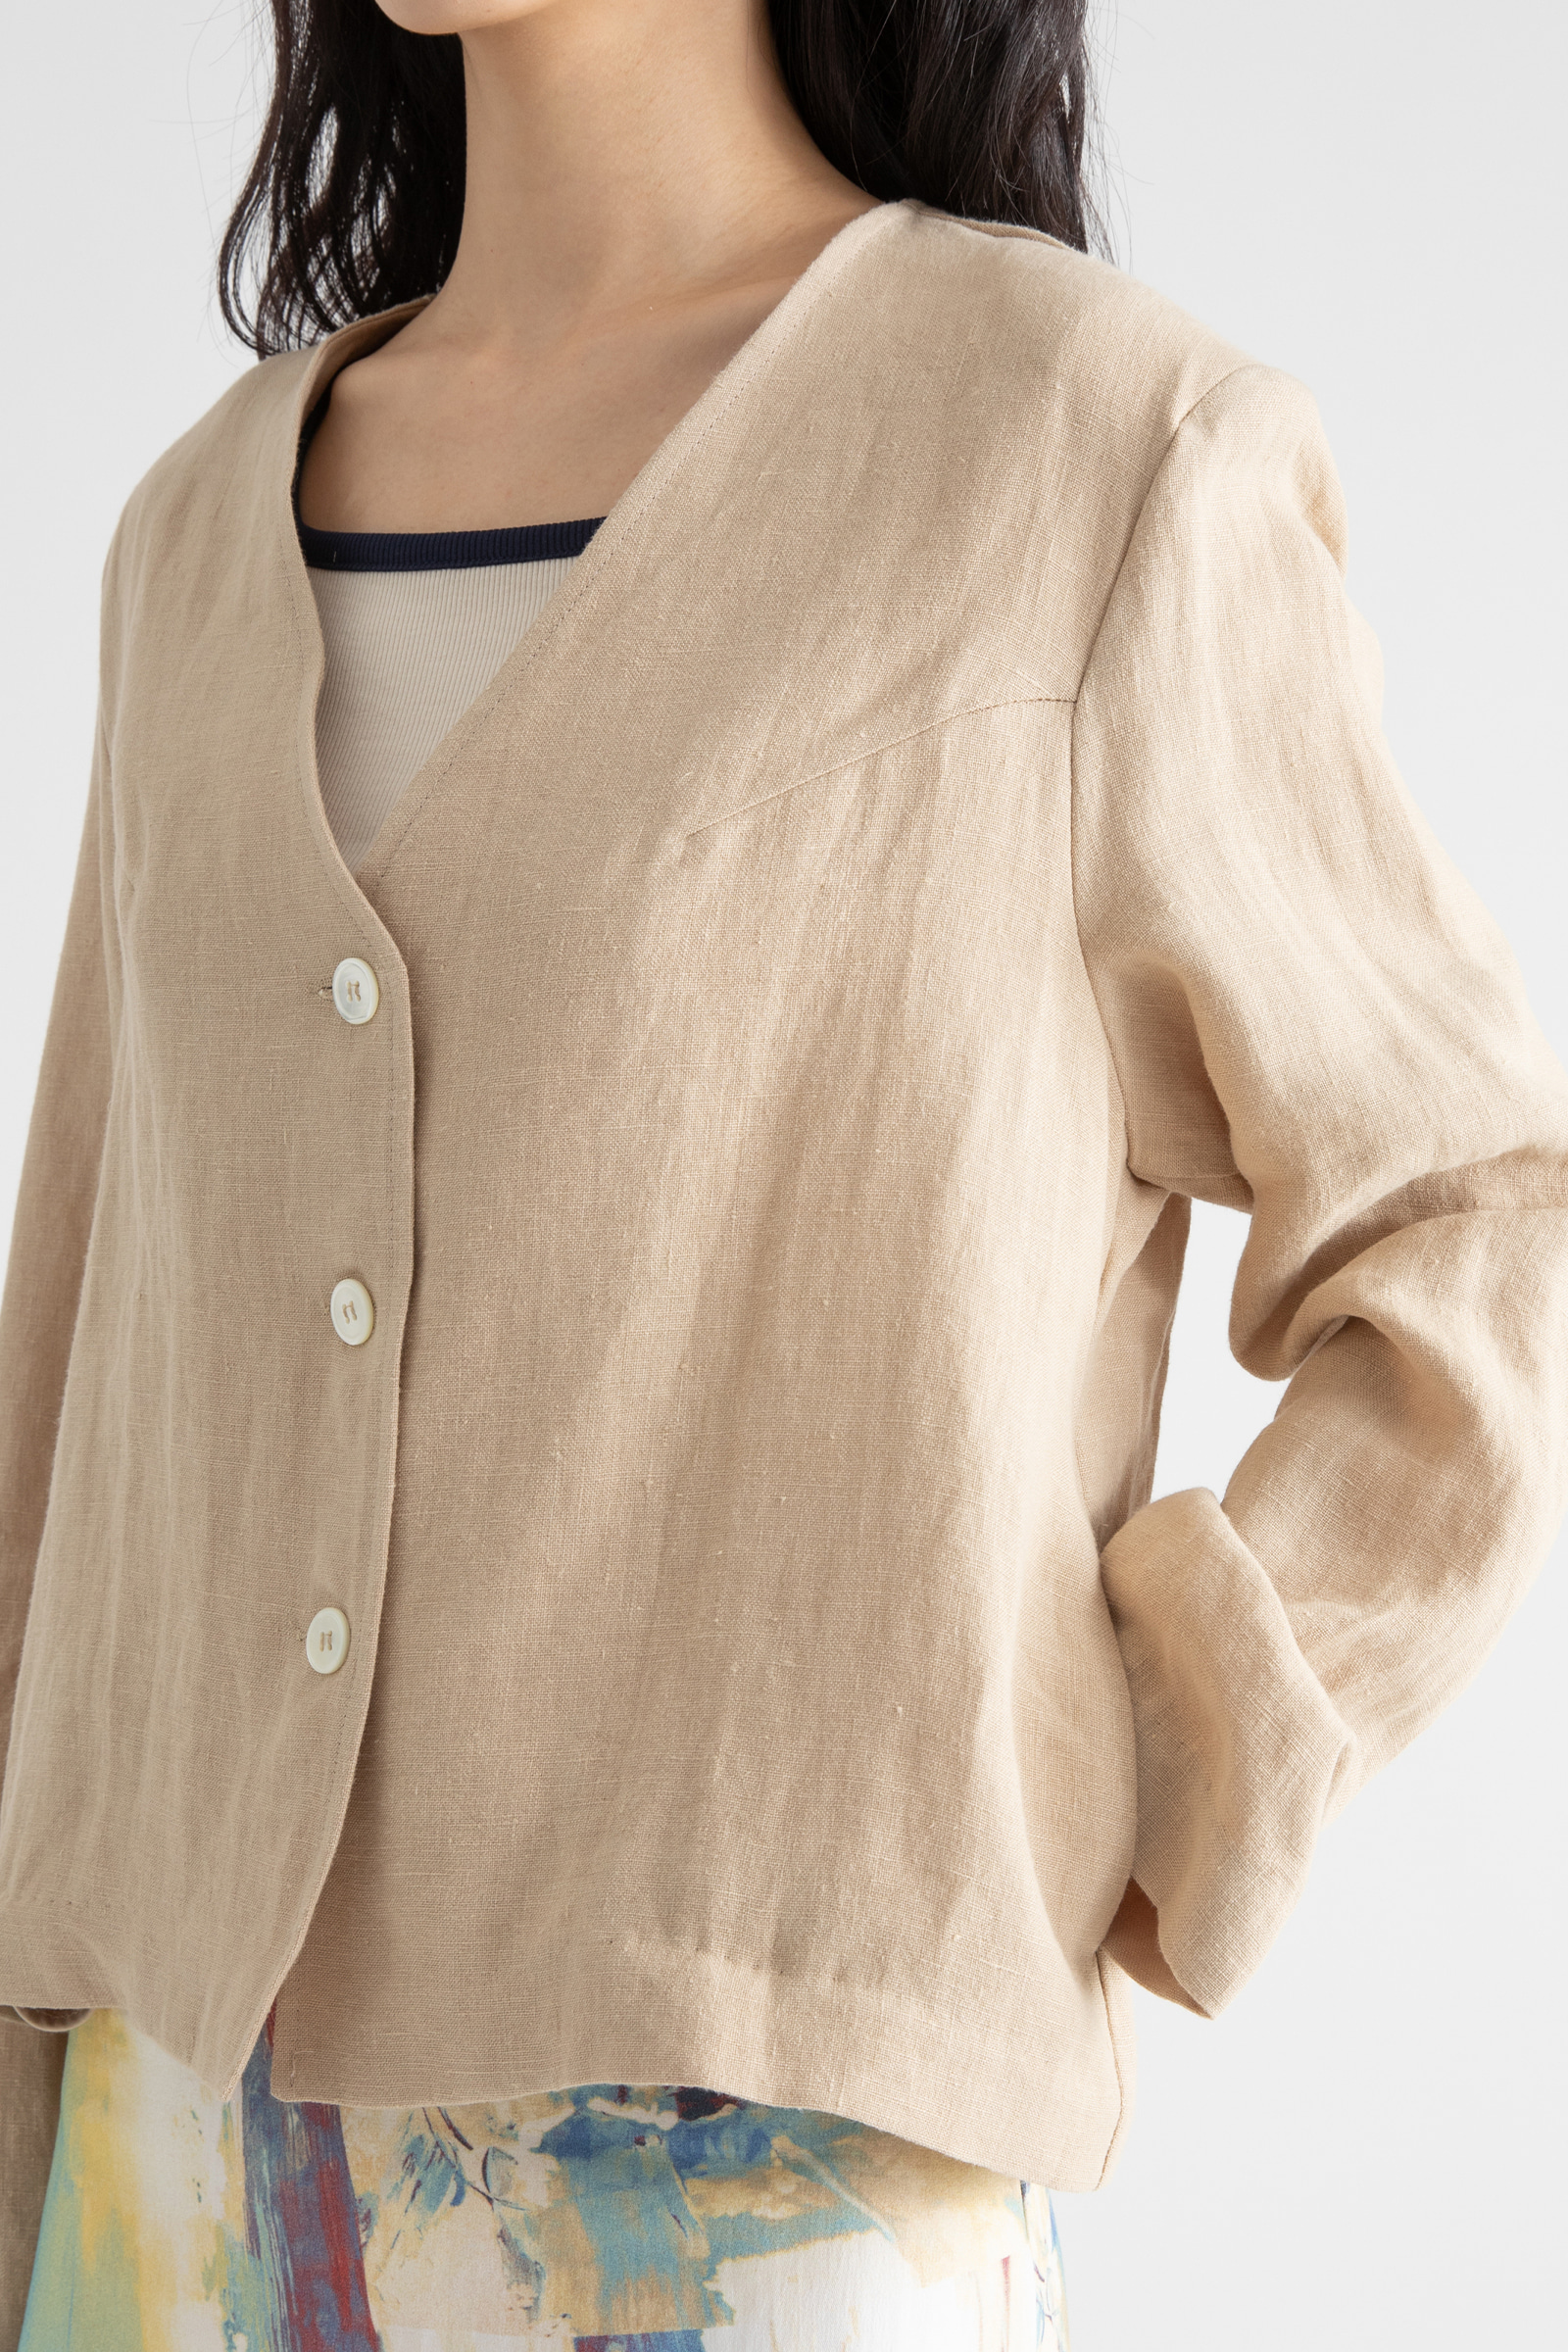 Simply Kararis Standard Linen Jacket